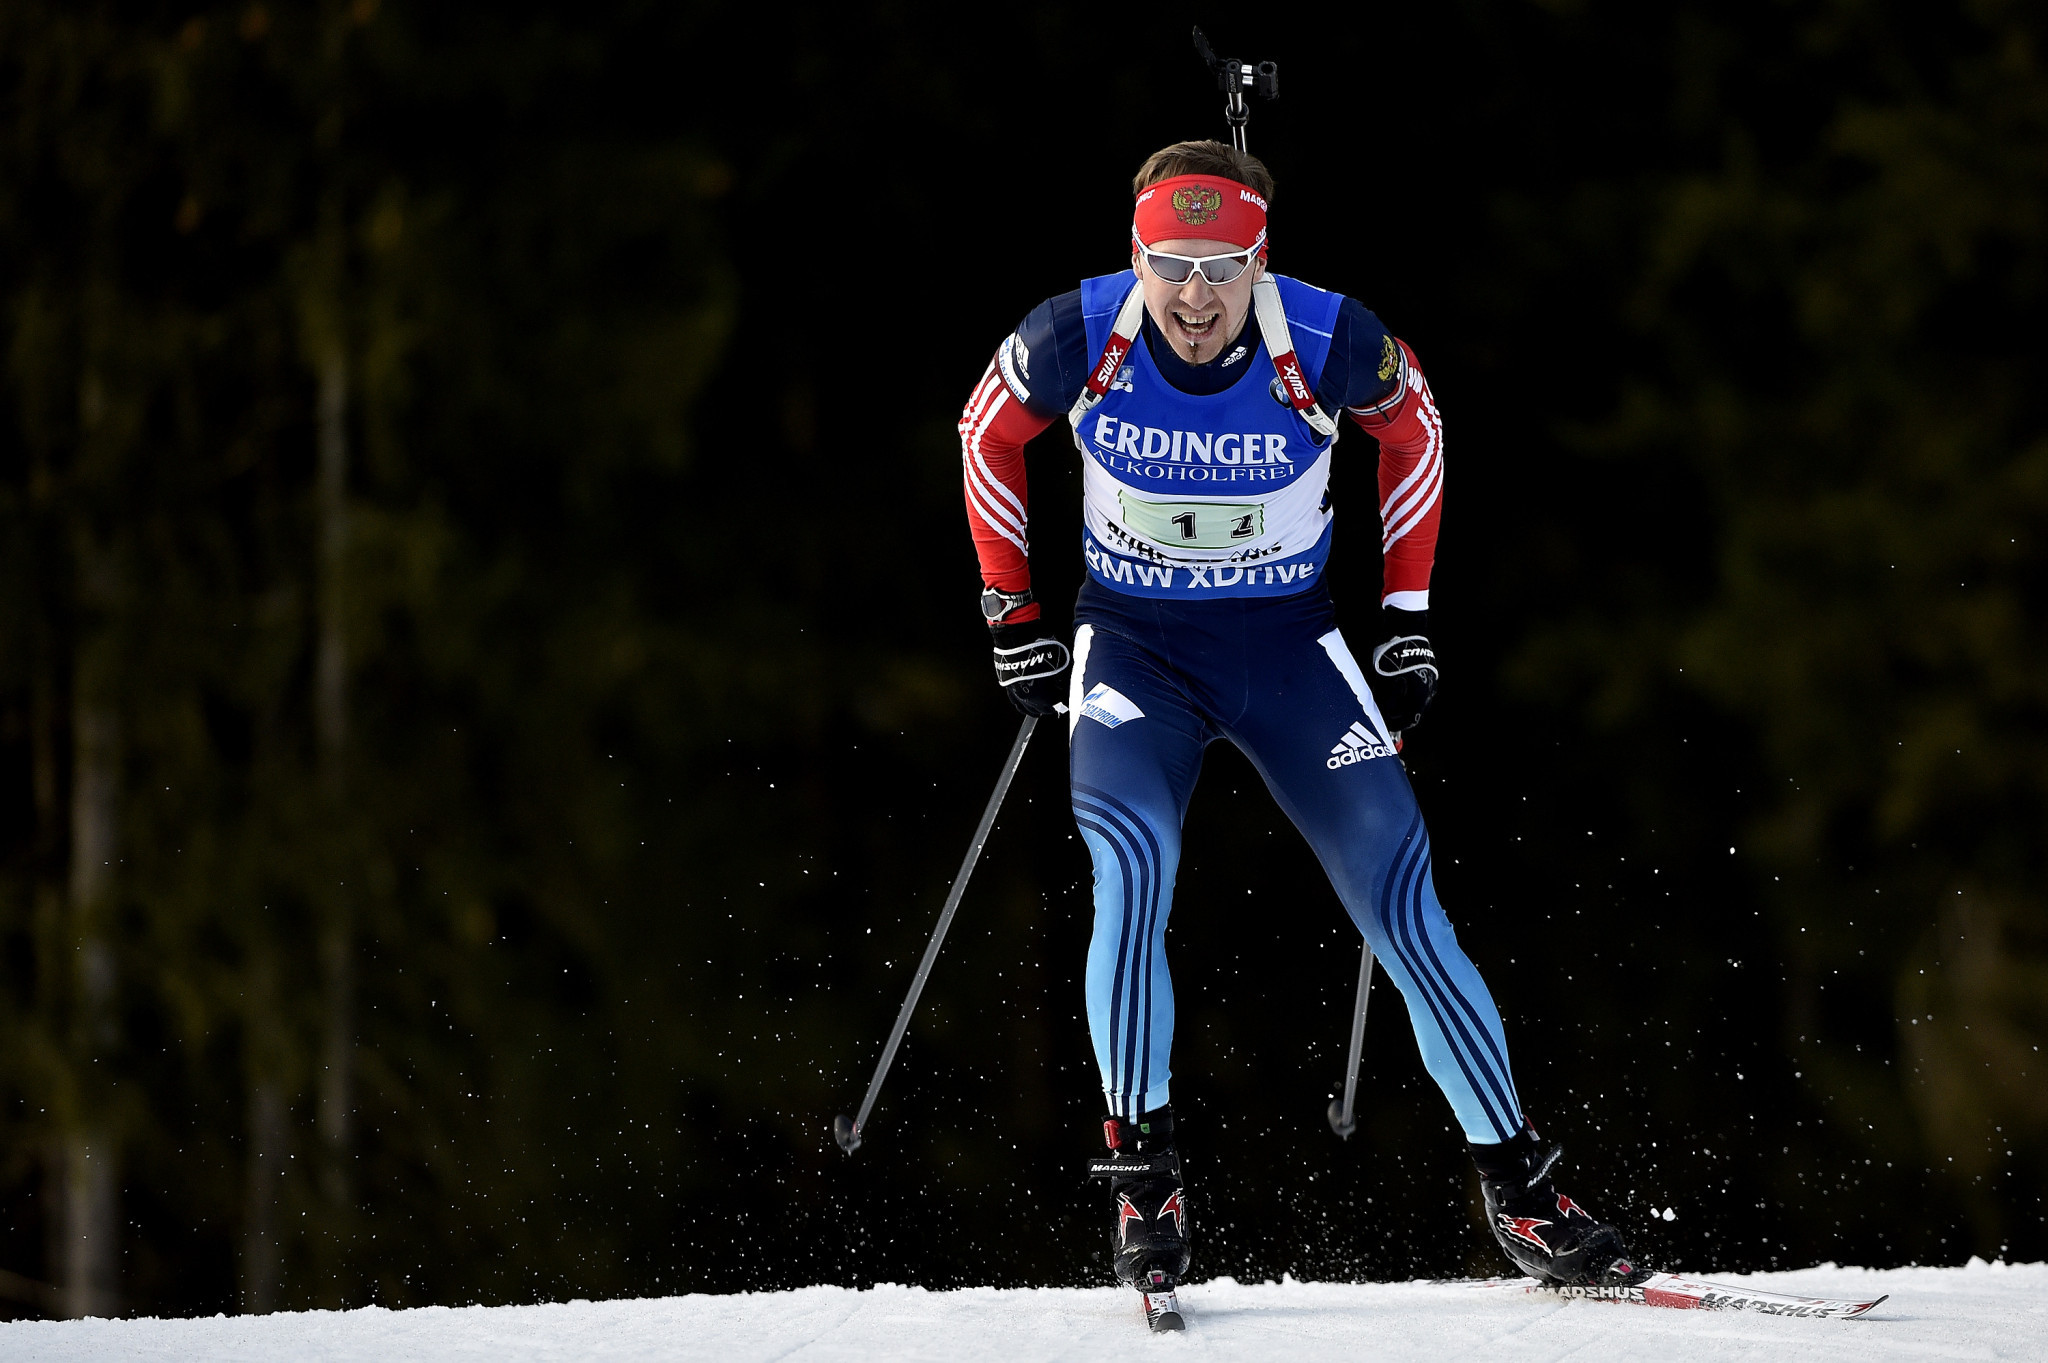 Lapshin vows to challenge provisional suspension from biathlon